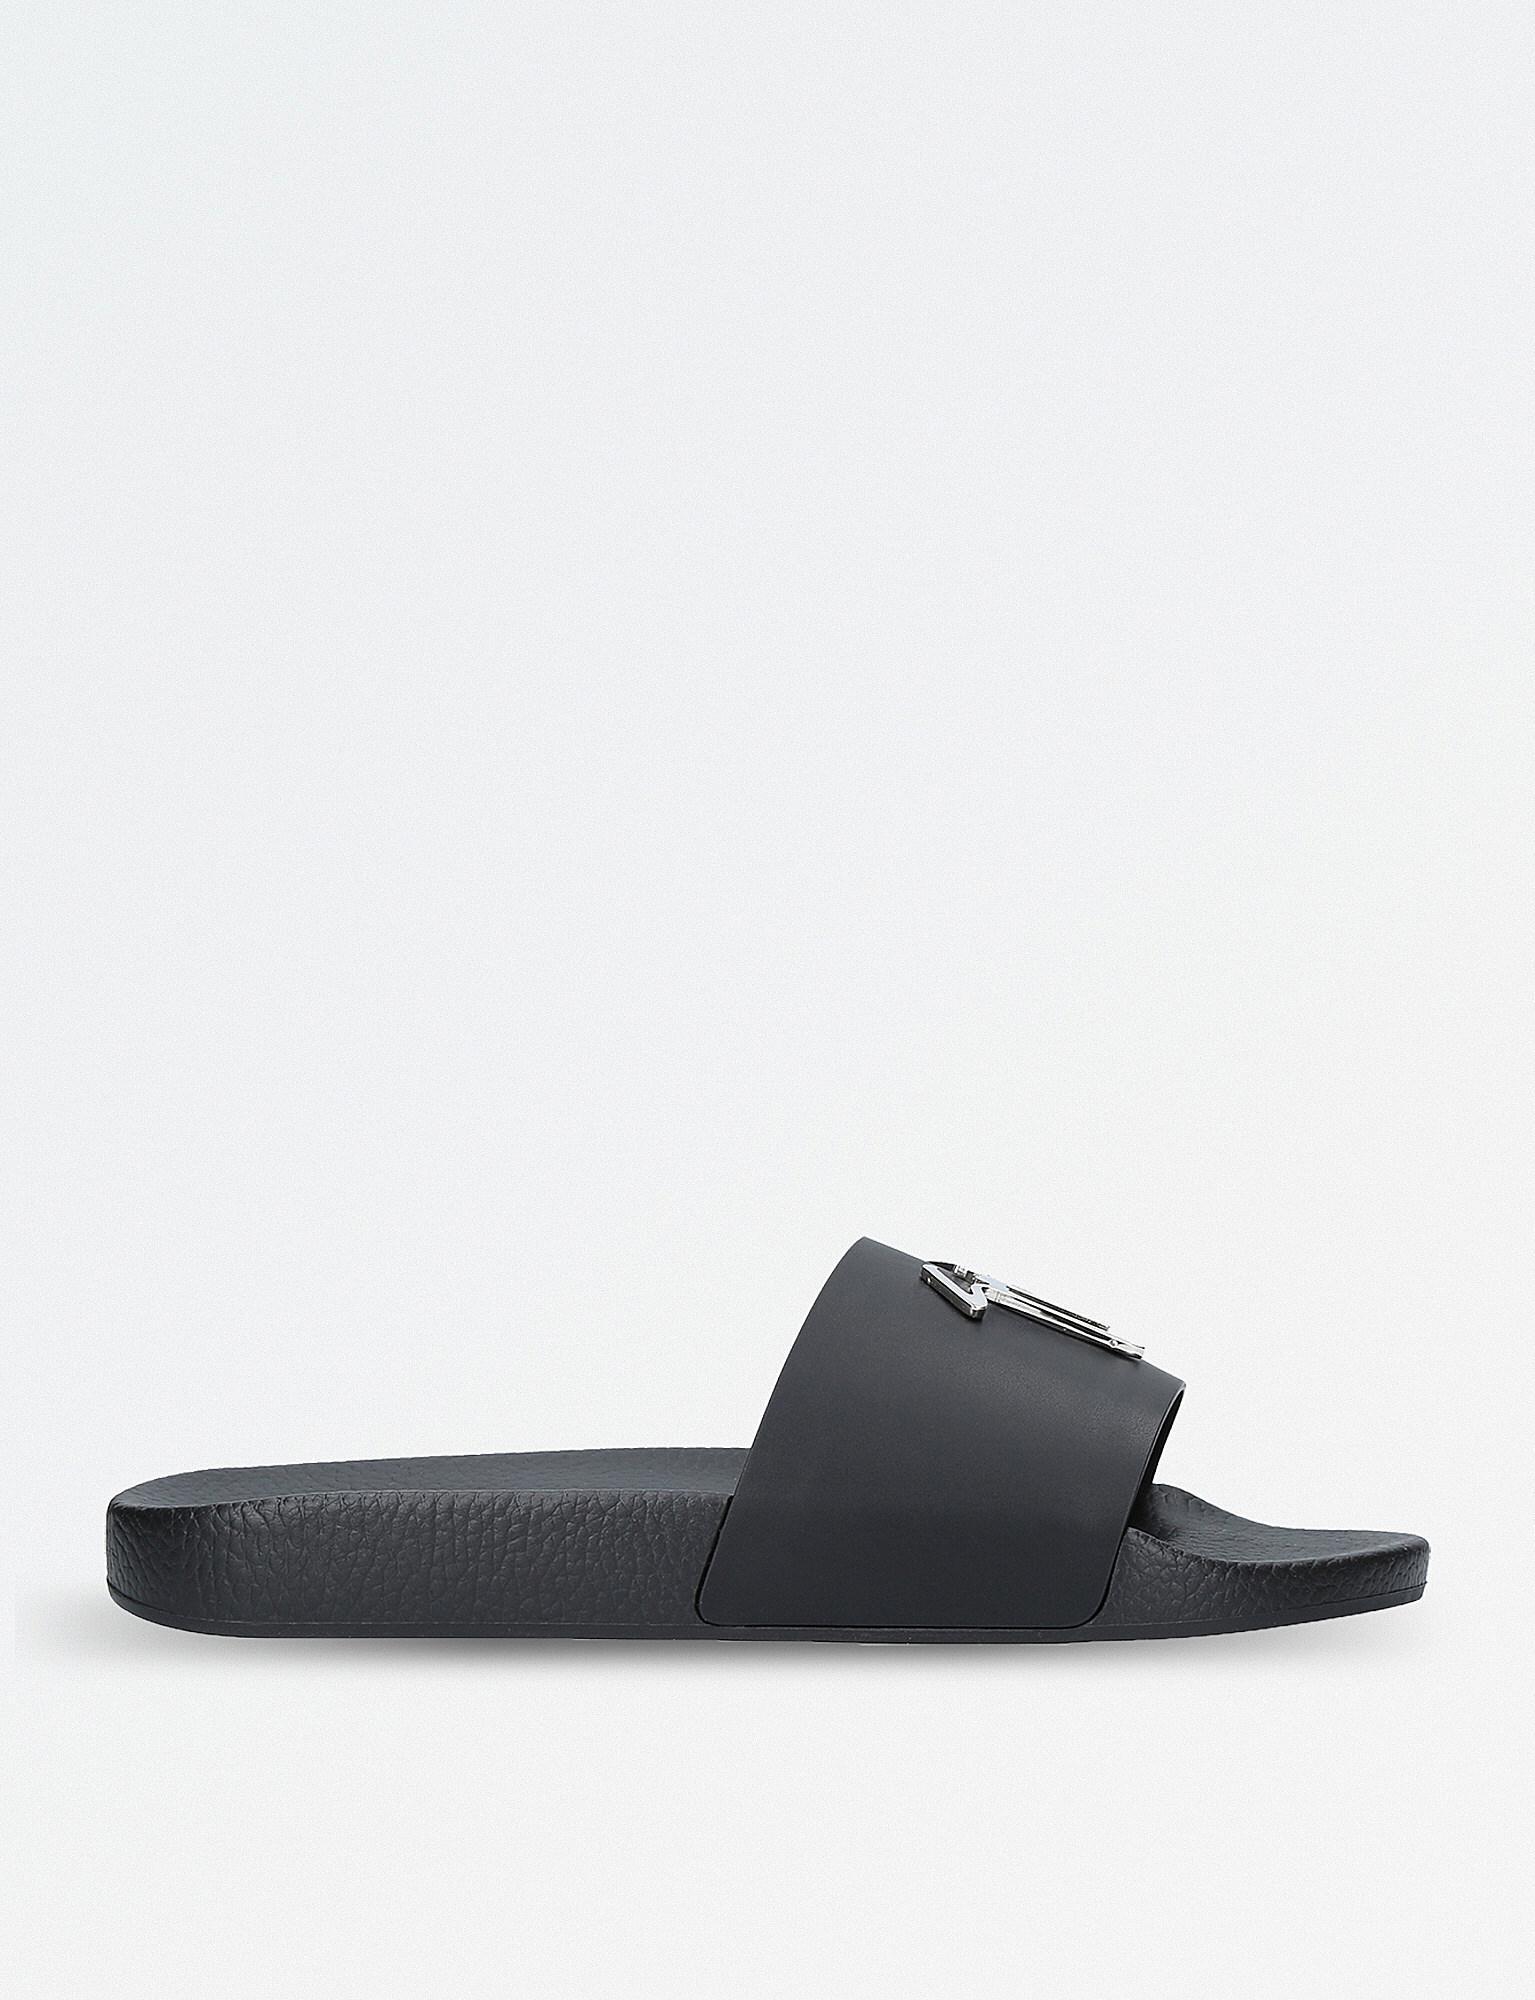 Giuseppe Zanotti Fabric sandal with black logo signature BRETT SIGNATURE 8FoH4